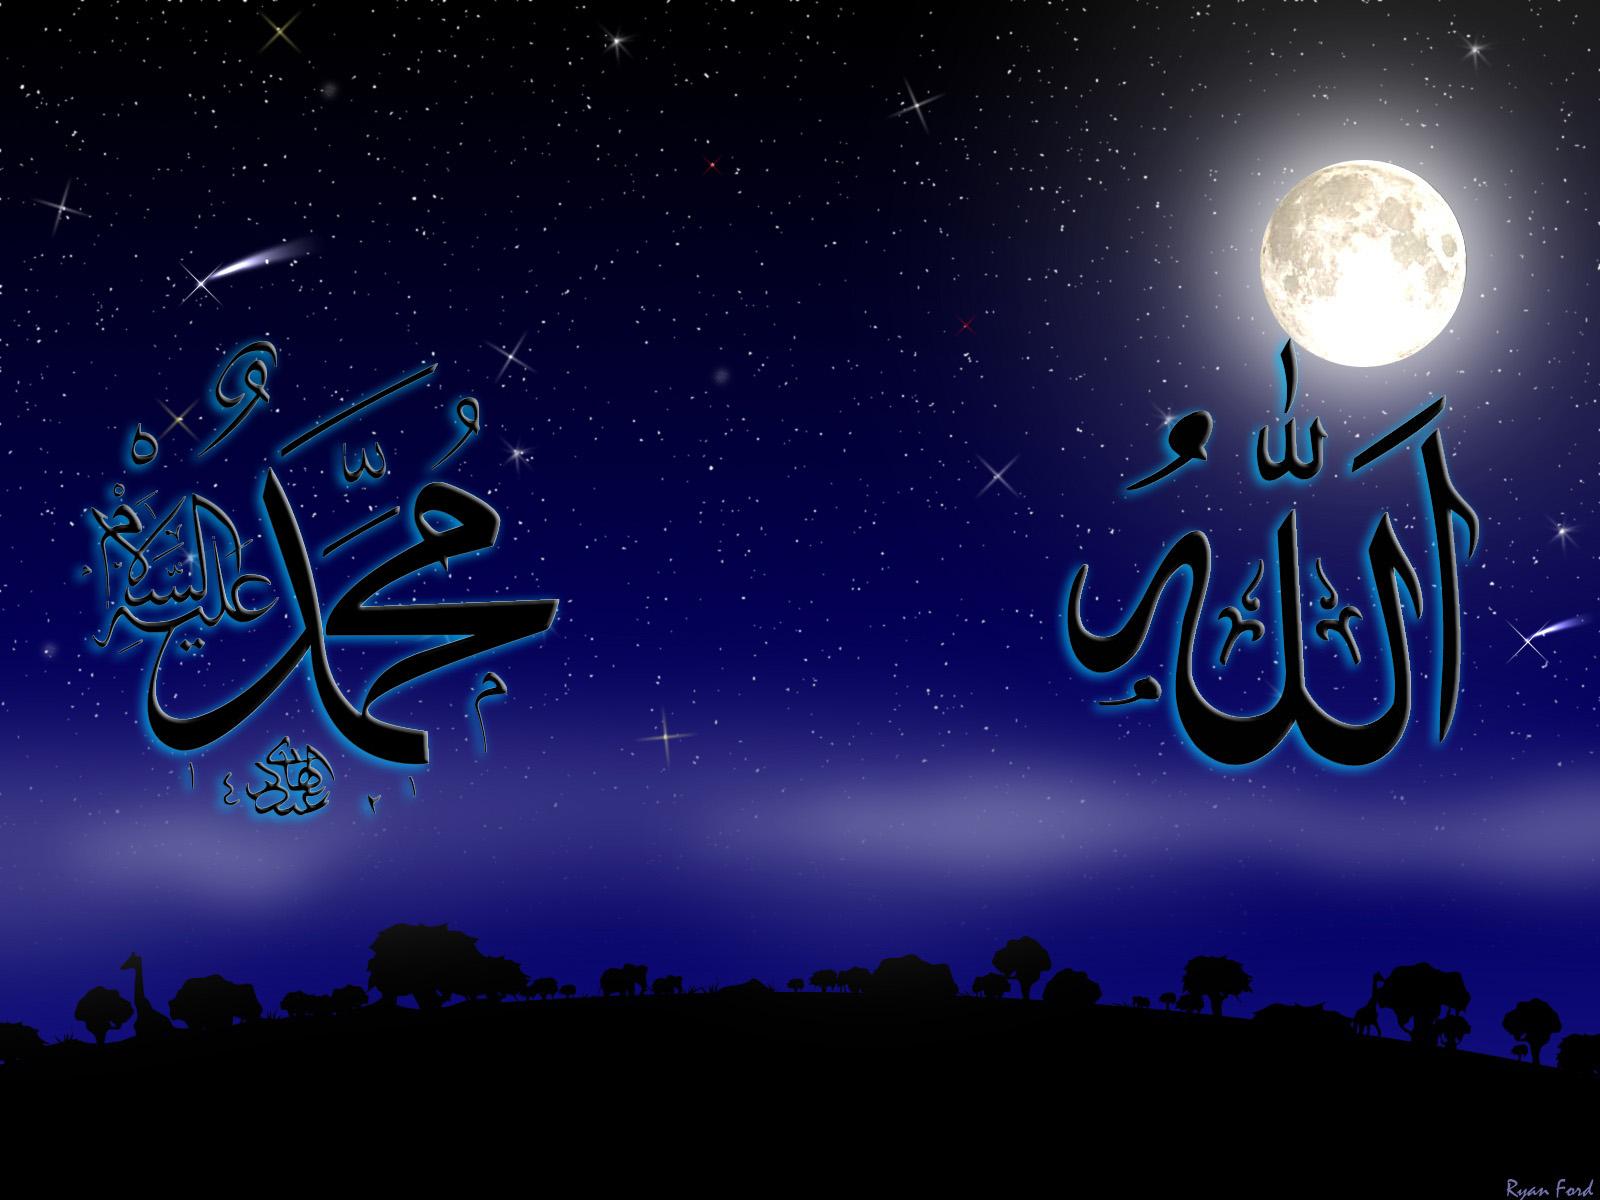 101 Wallpaper Gambar Islami 1600x1200